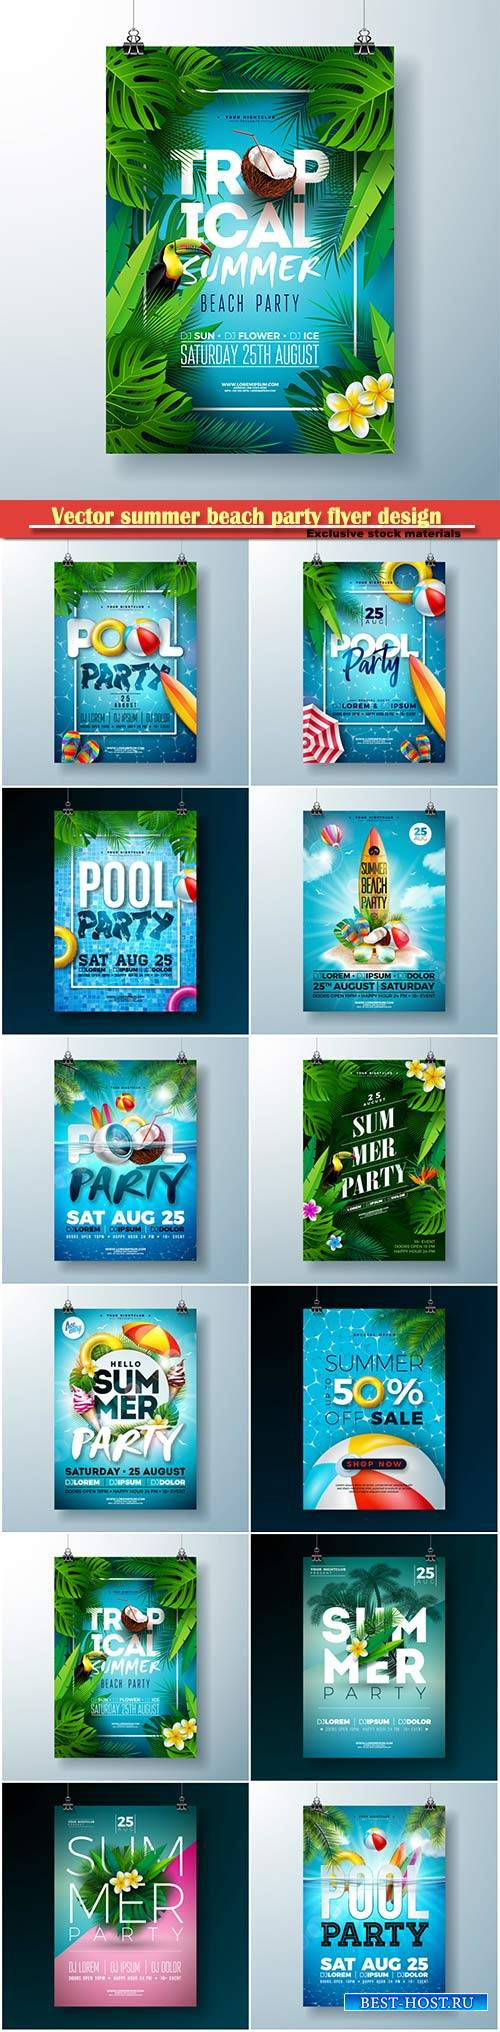 Vector summer beach party flyer design # 3